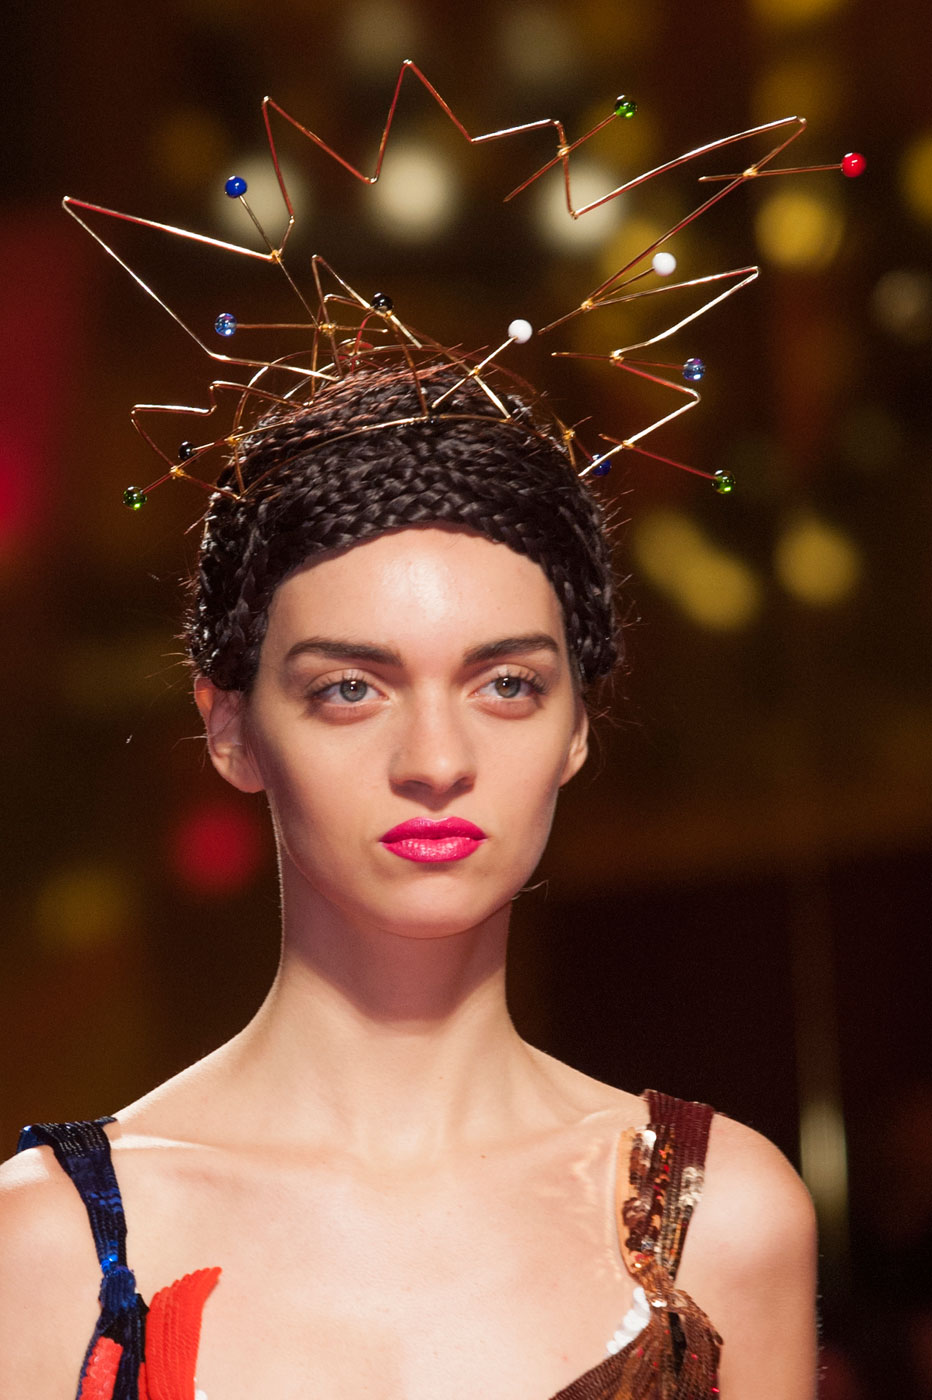 Schiaparelli-fashion-runway-show-close-ups-haute-couture-paris-spring-summer-2015-the-impression-04